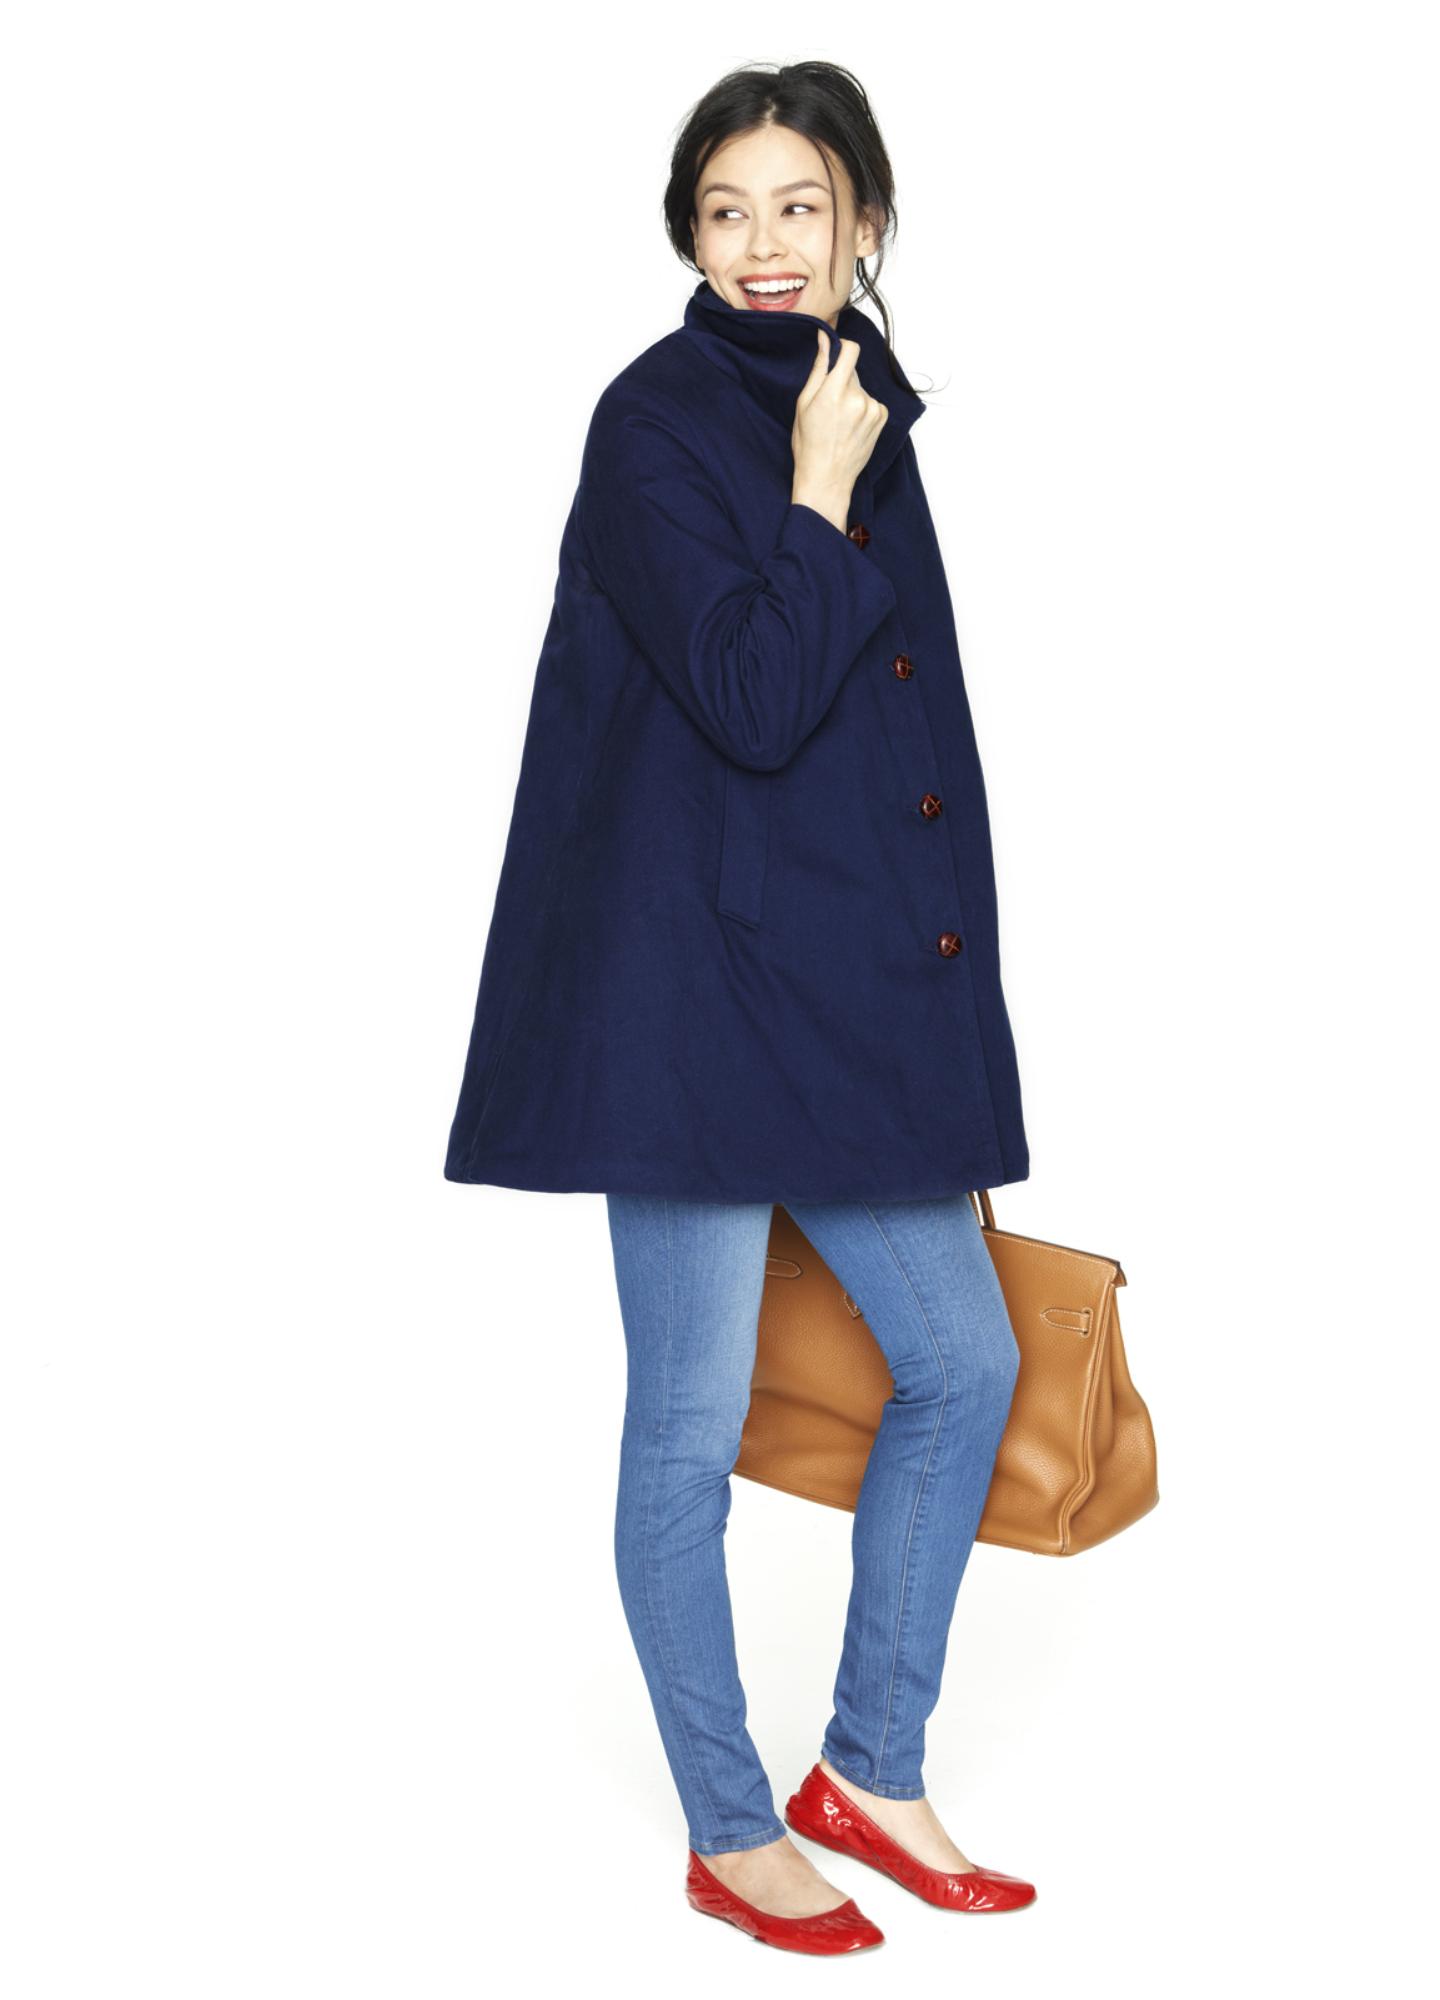 pre bambini wear the coat sale sales hatch collection #2: 2e a76dcc109c34bebf0928e5a51